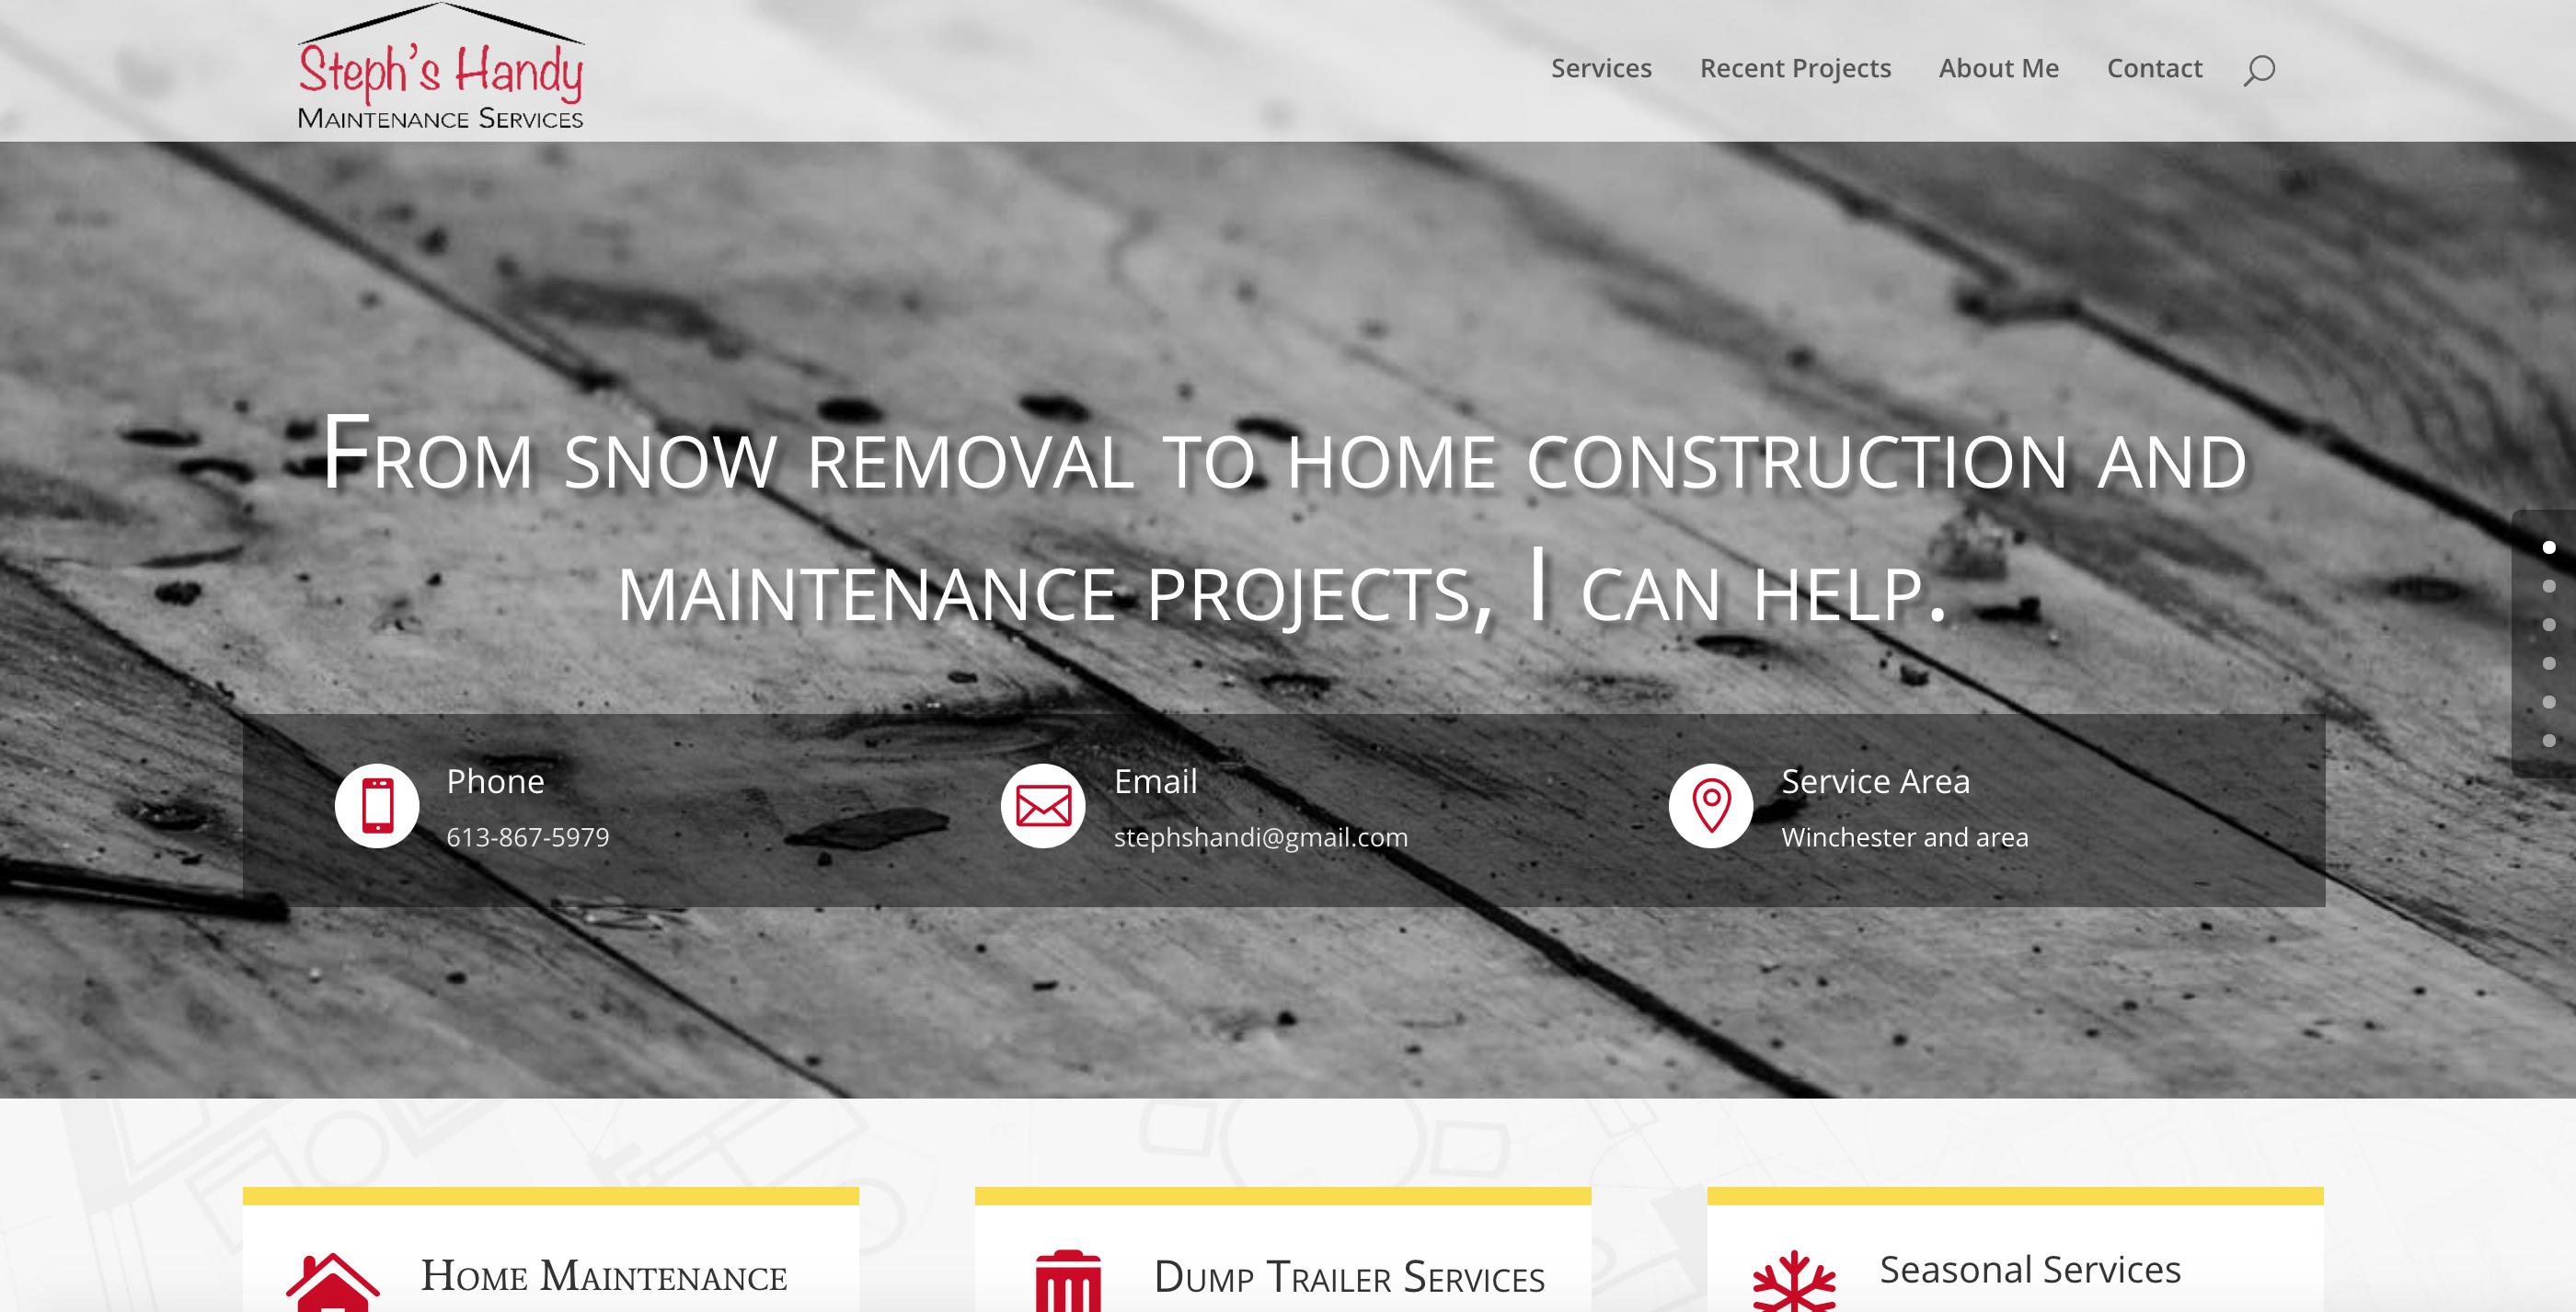 Steph's Handy Maintenance Services